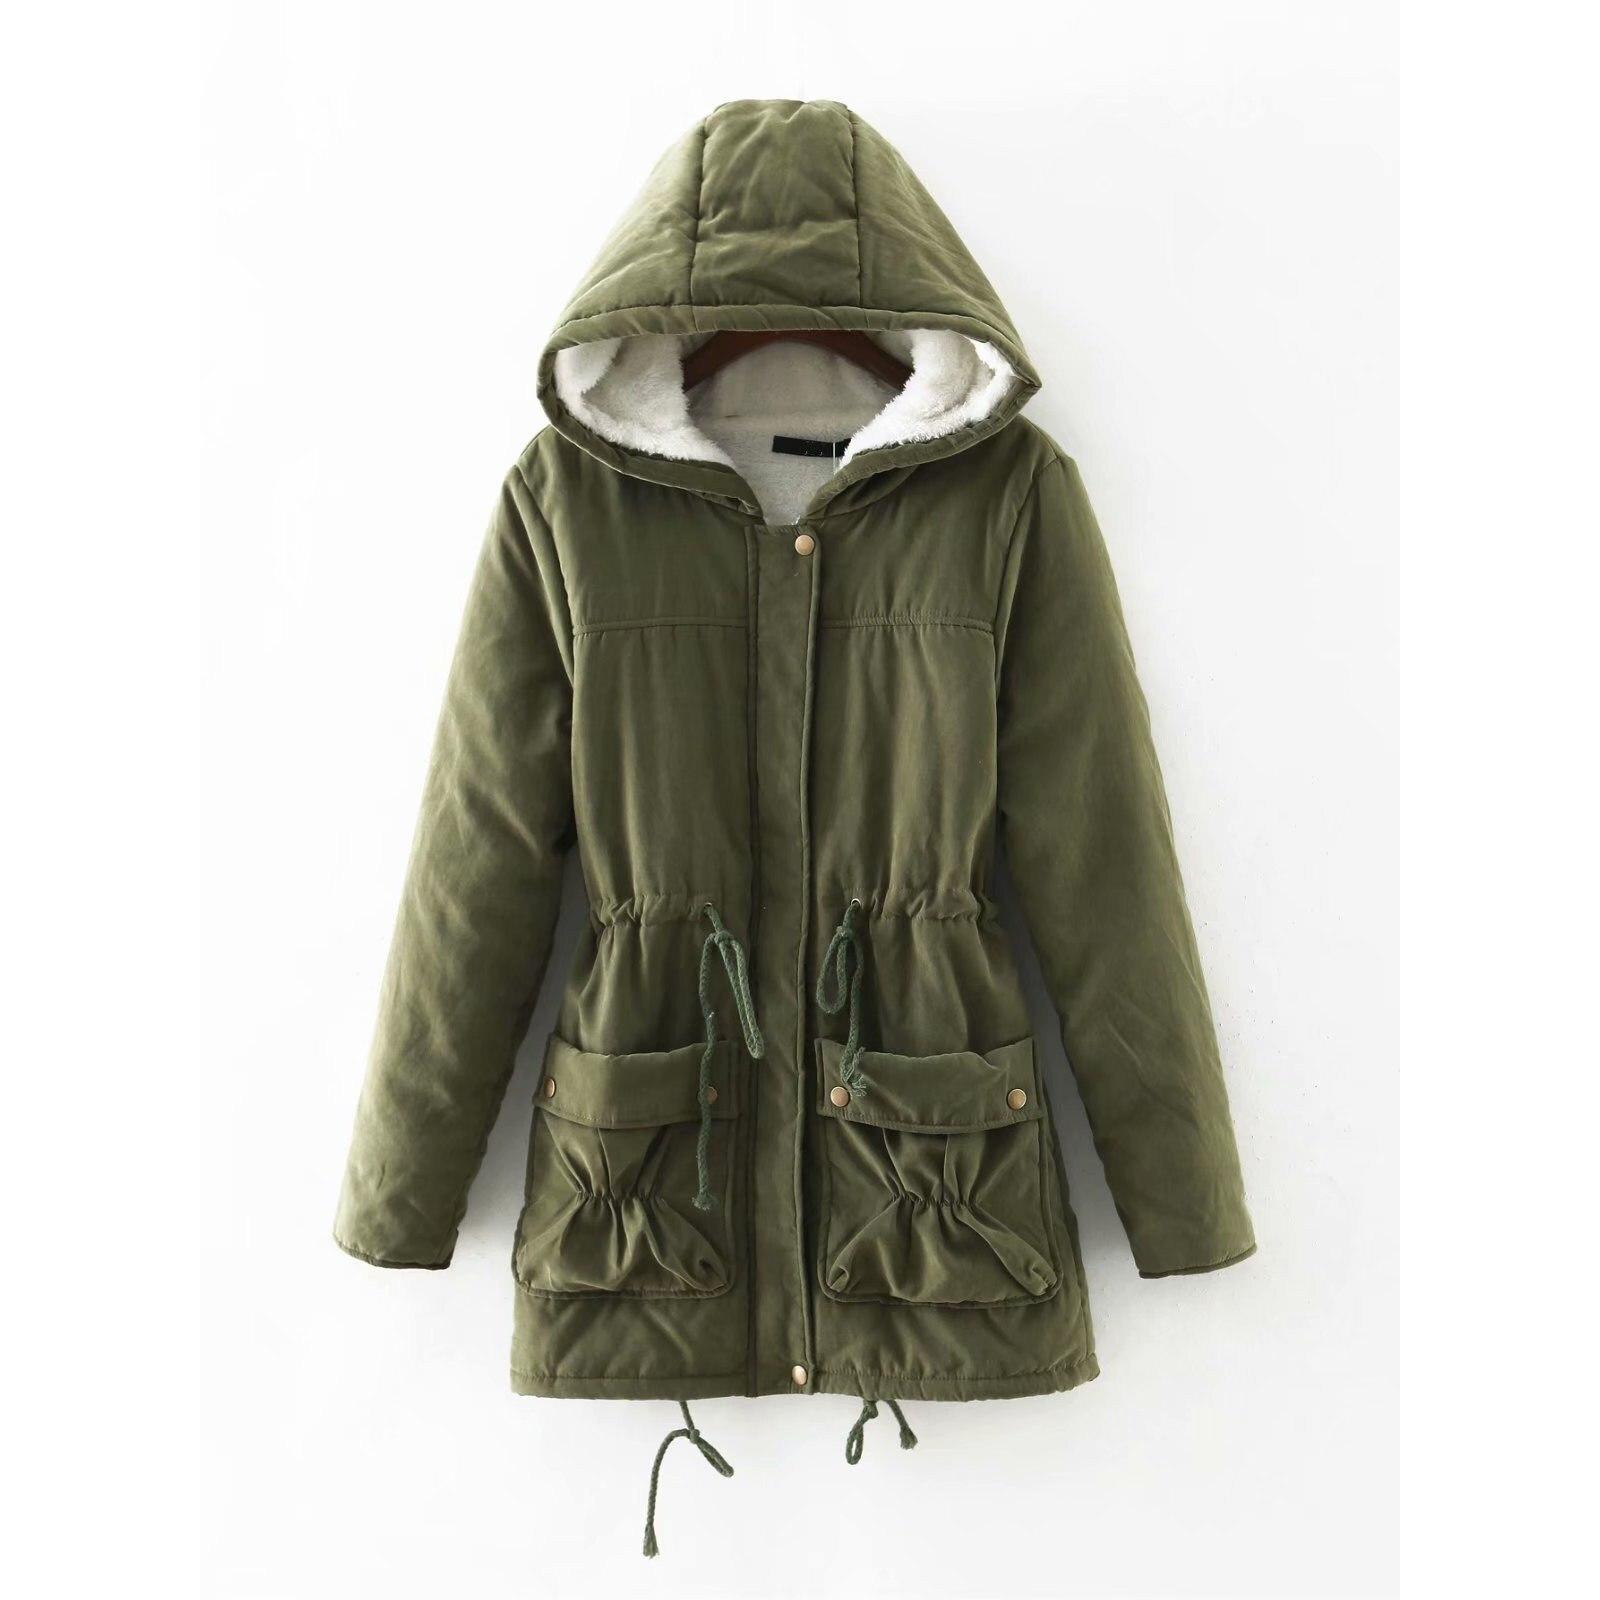 Winter Women Casual Cotton Zipper Padded Jackets Loose Medium Long Hooded   Parkas   Drawstring Wadded Quilt Snow Outwear Overcoat